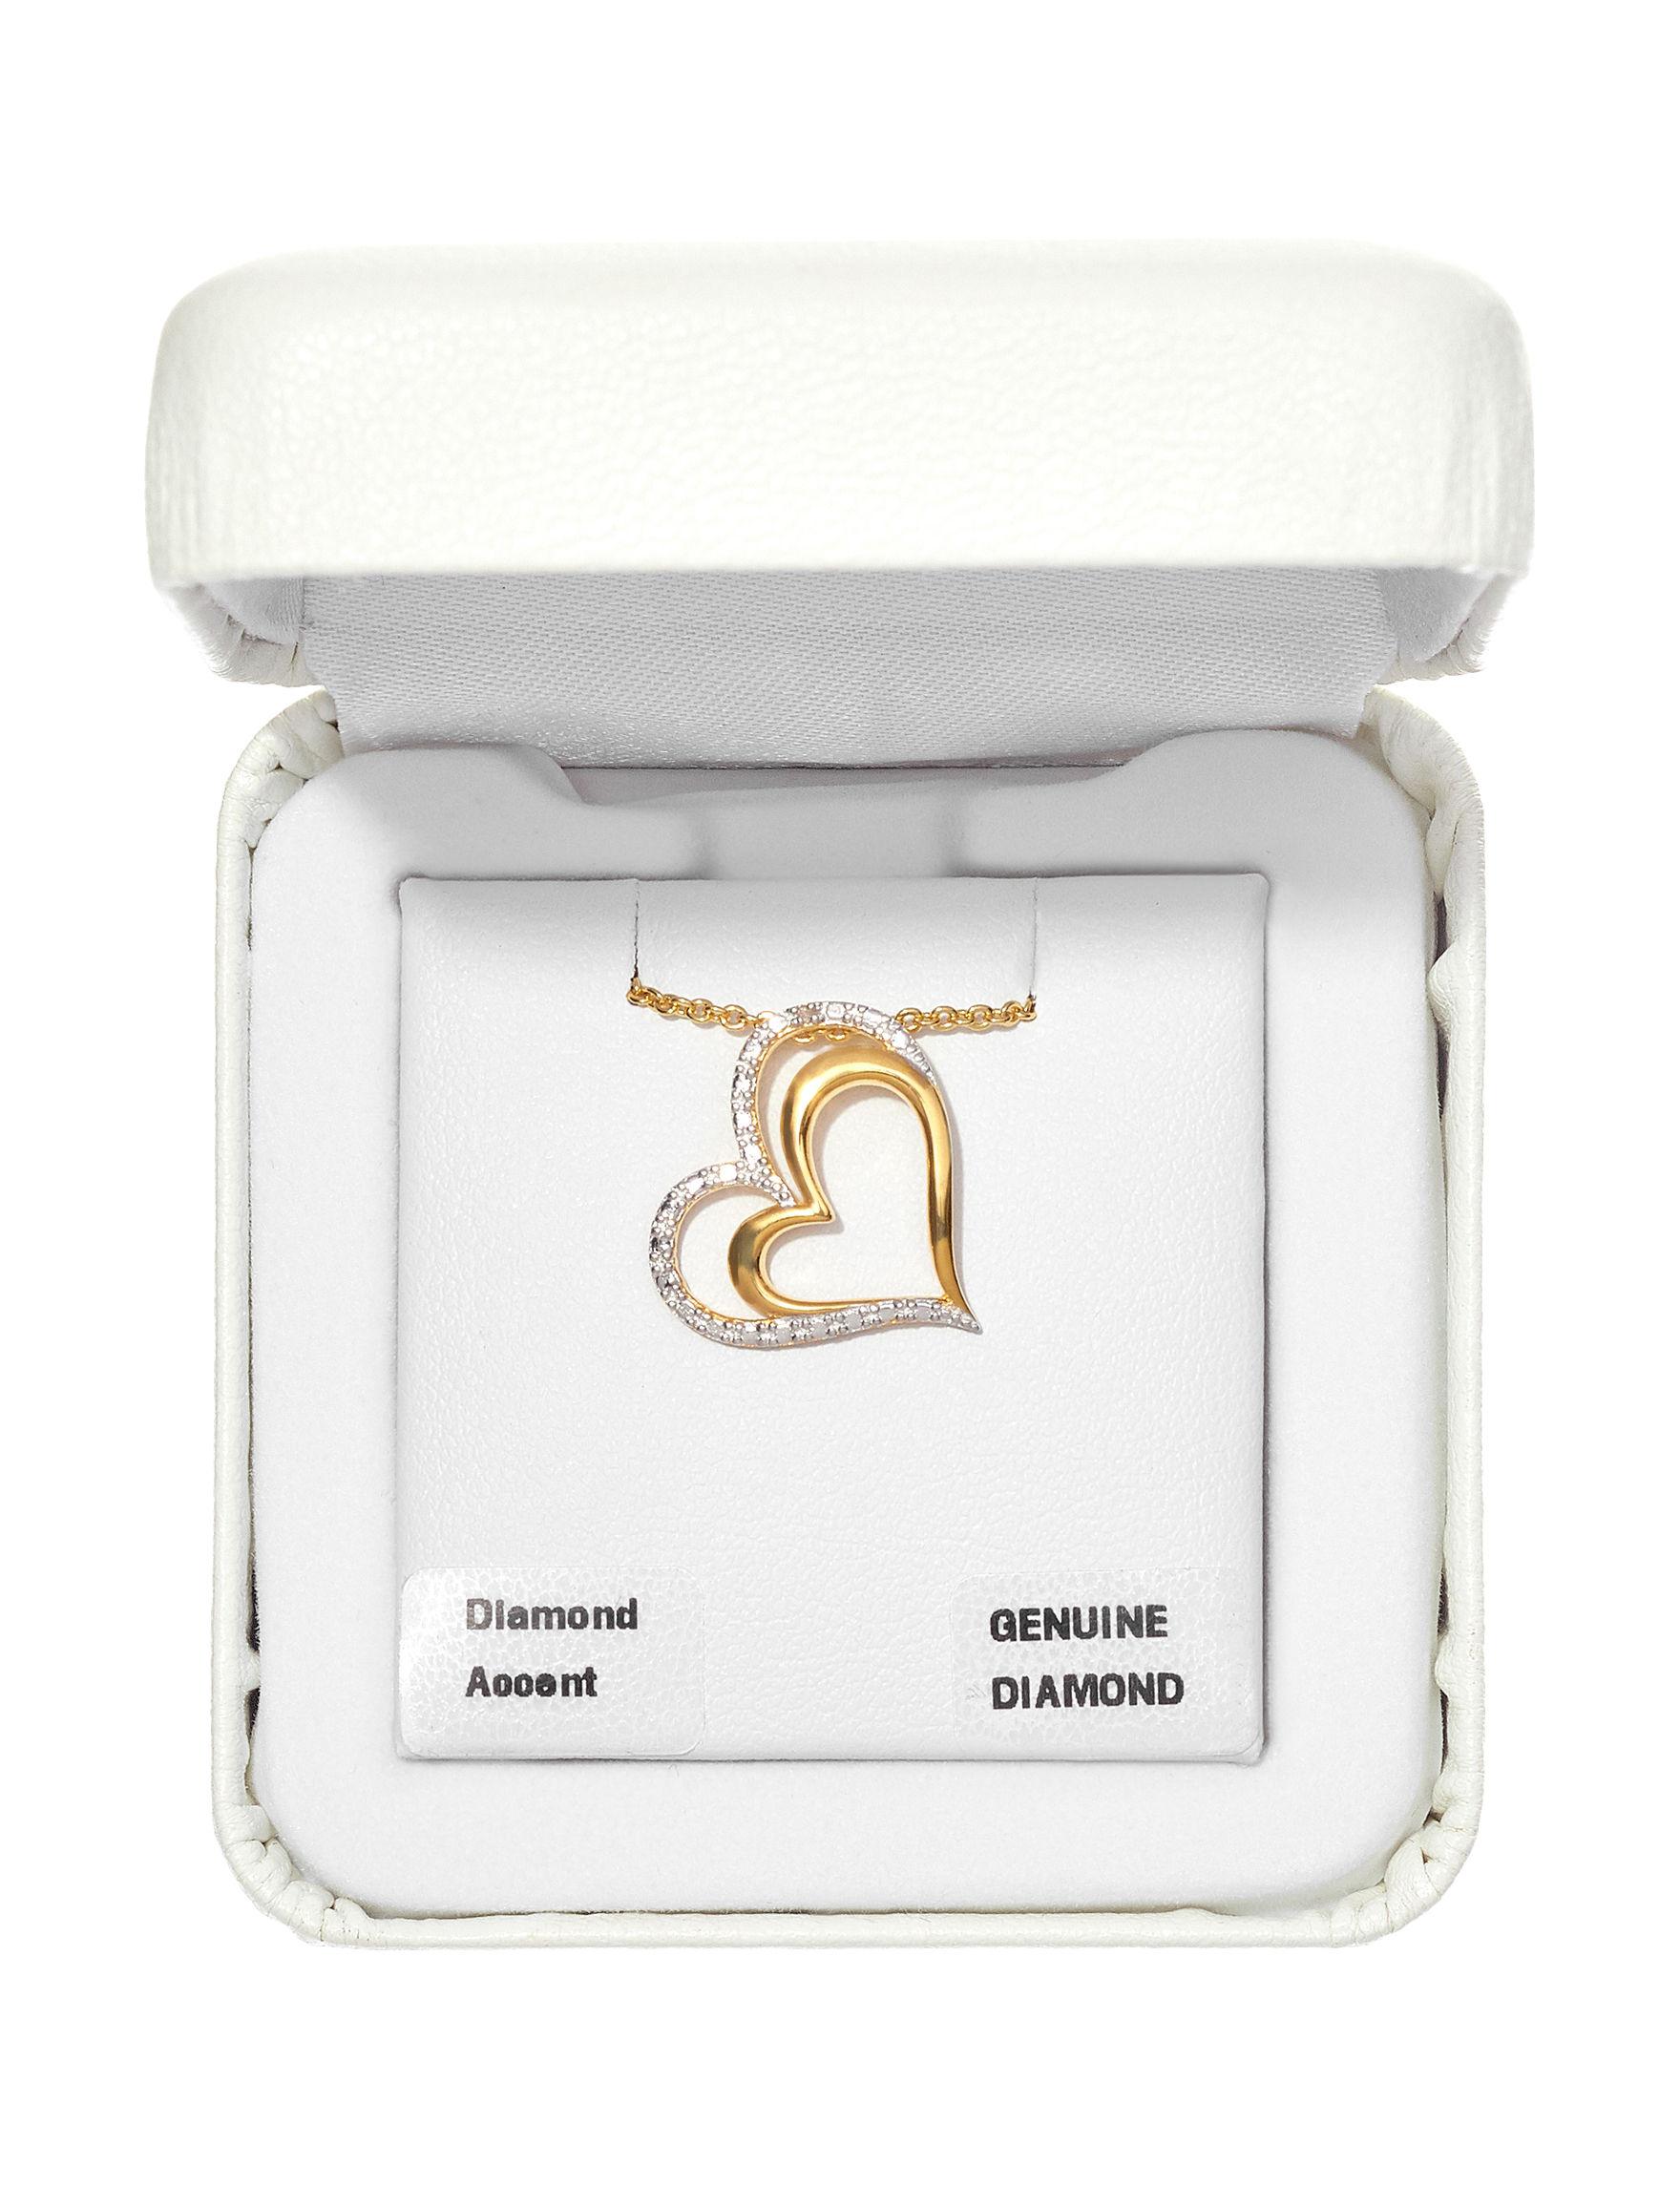 Marsala Gold / Gemstone Necklaces & Pendants Fine Jewelry